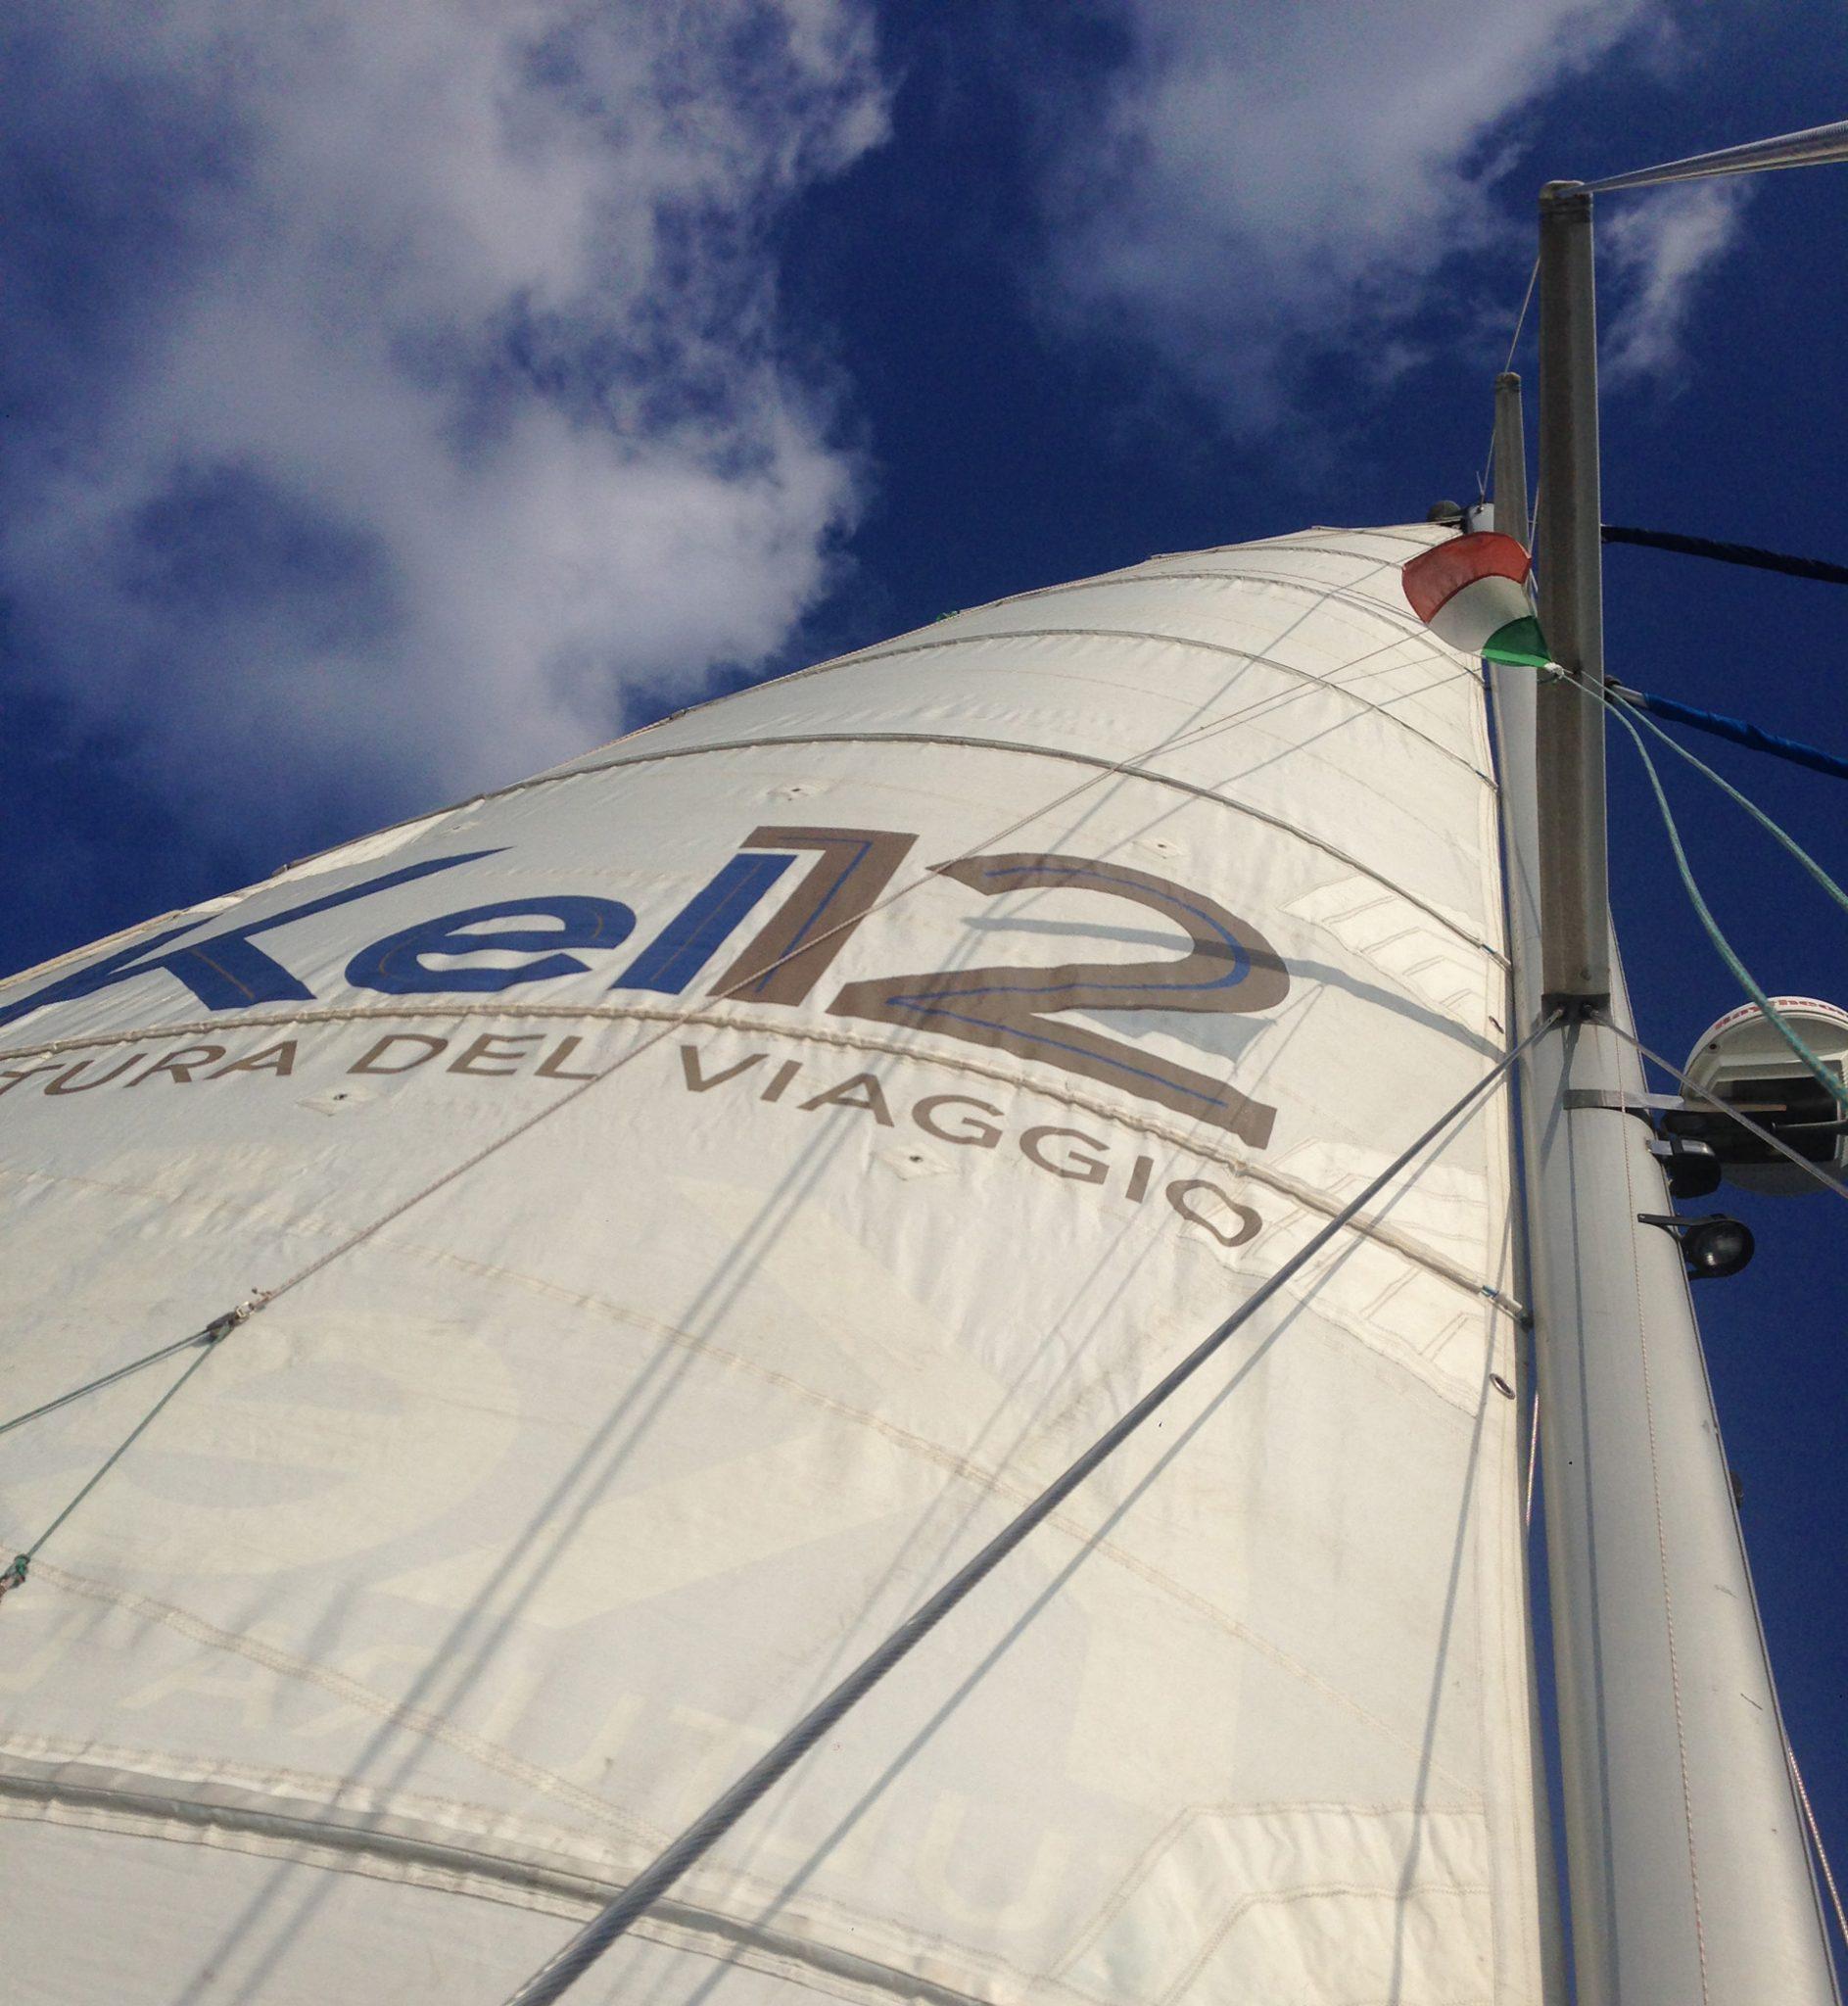 dream1-sailing-charter-cruise-liguria-genova-kel12-1